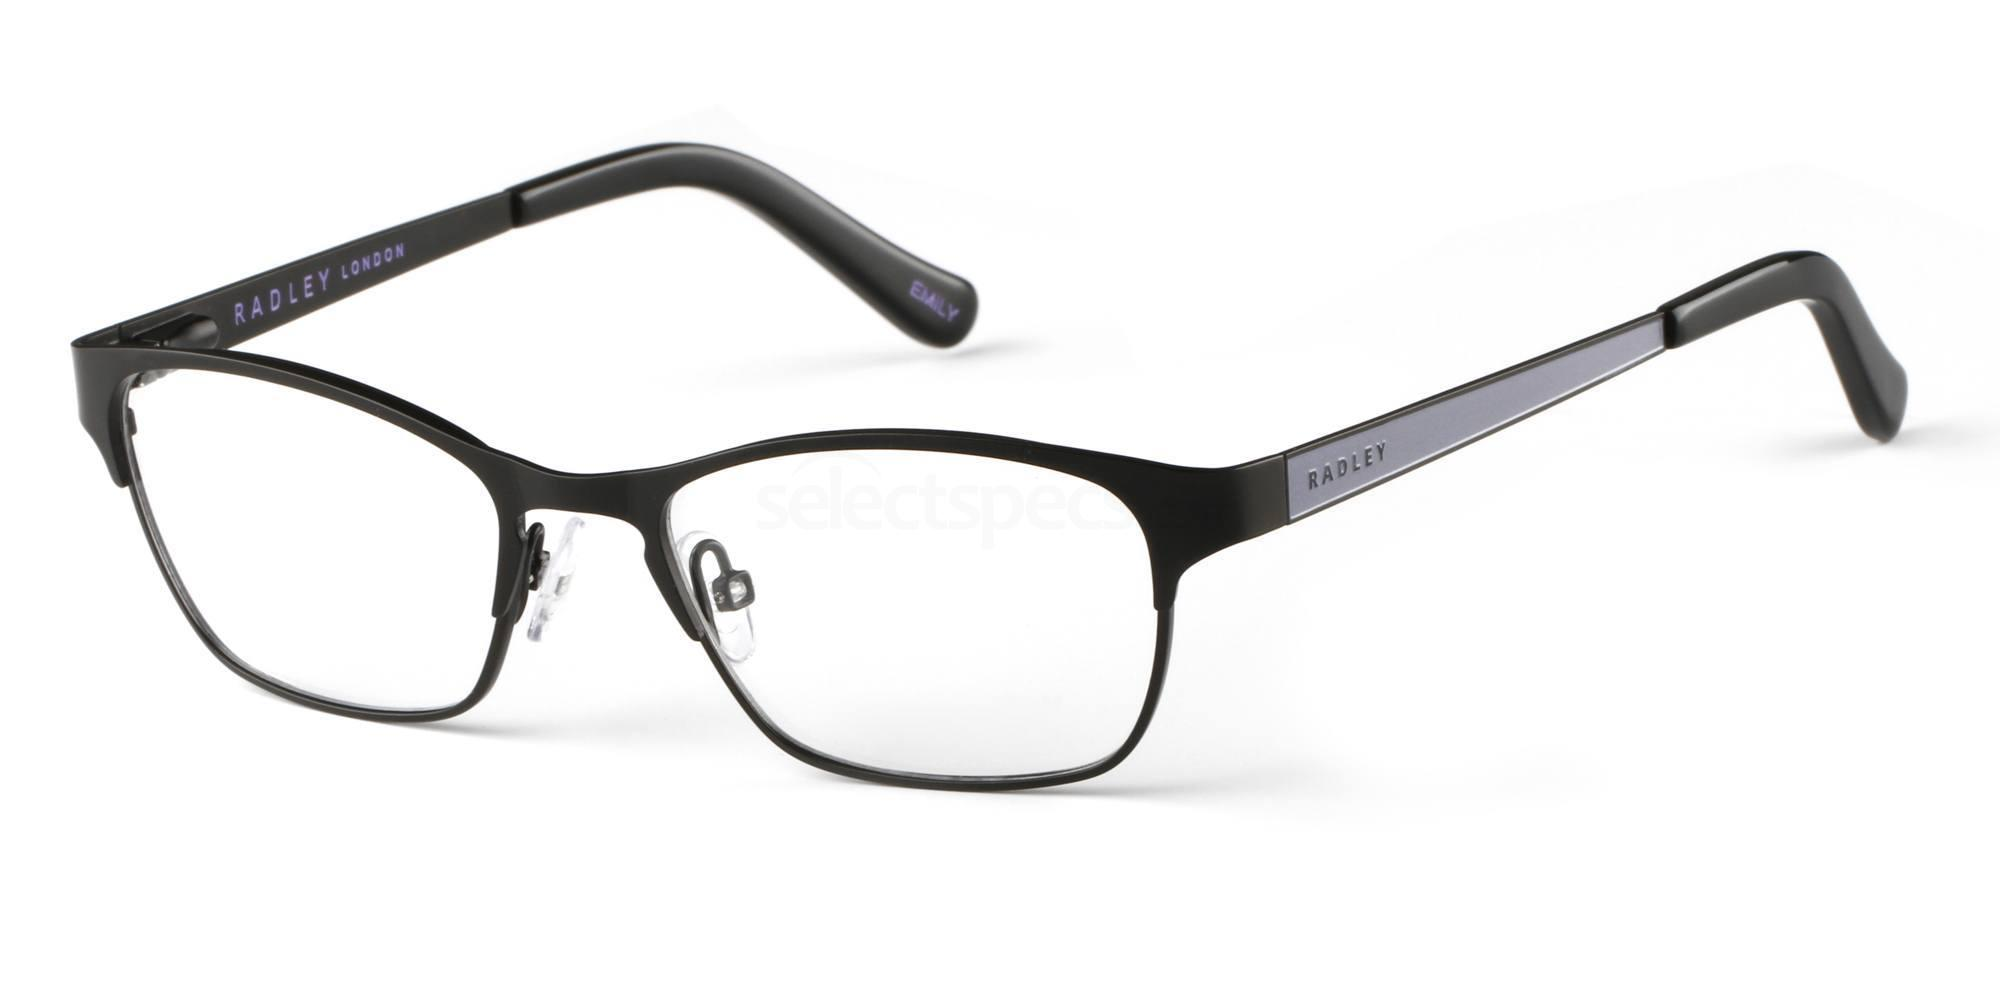 004 RDO-EMILY Glasses, Radley London